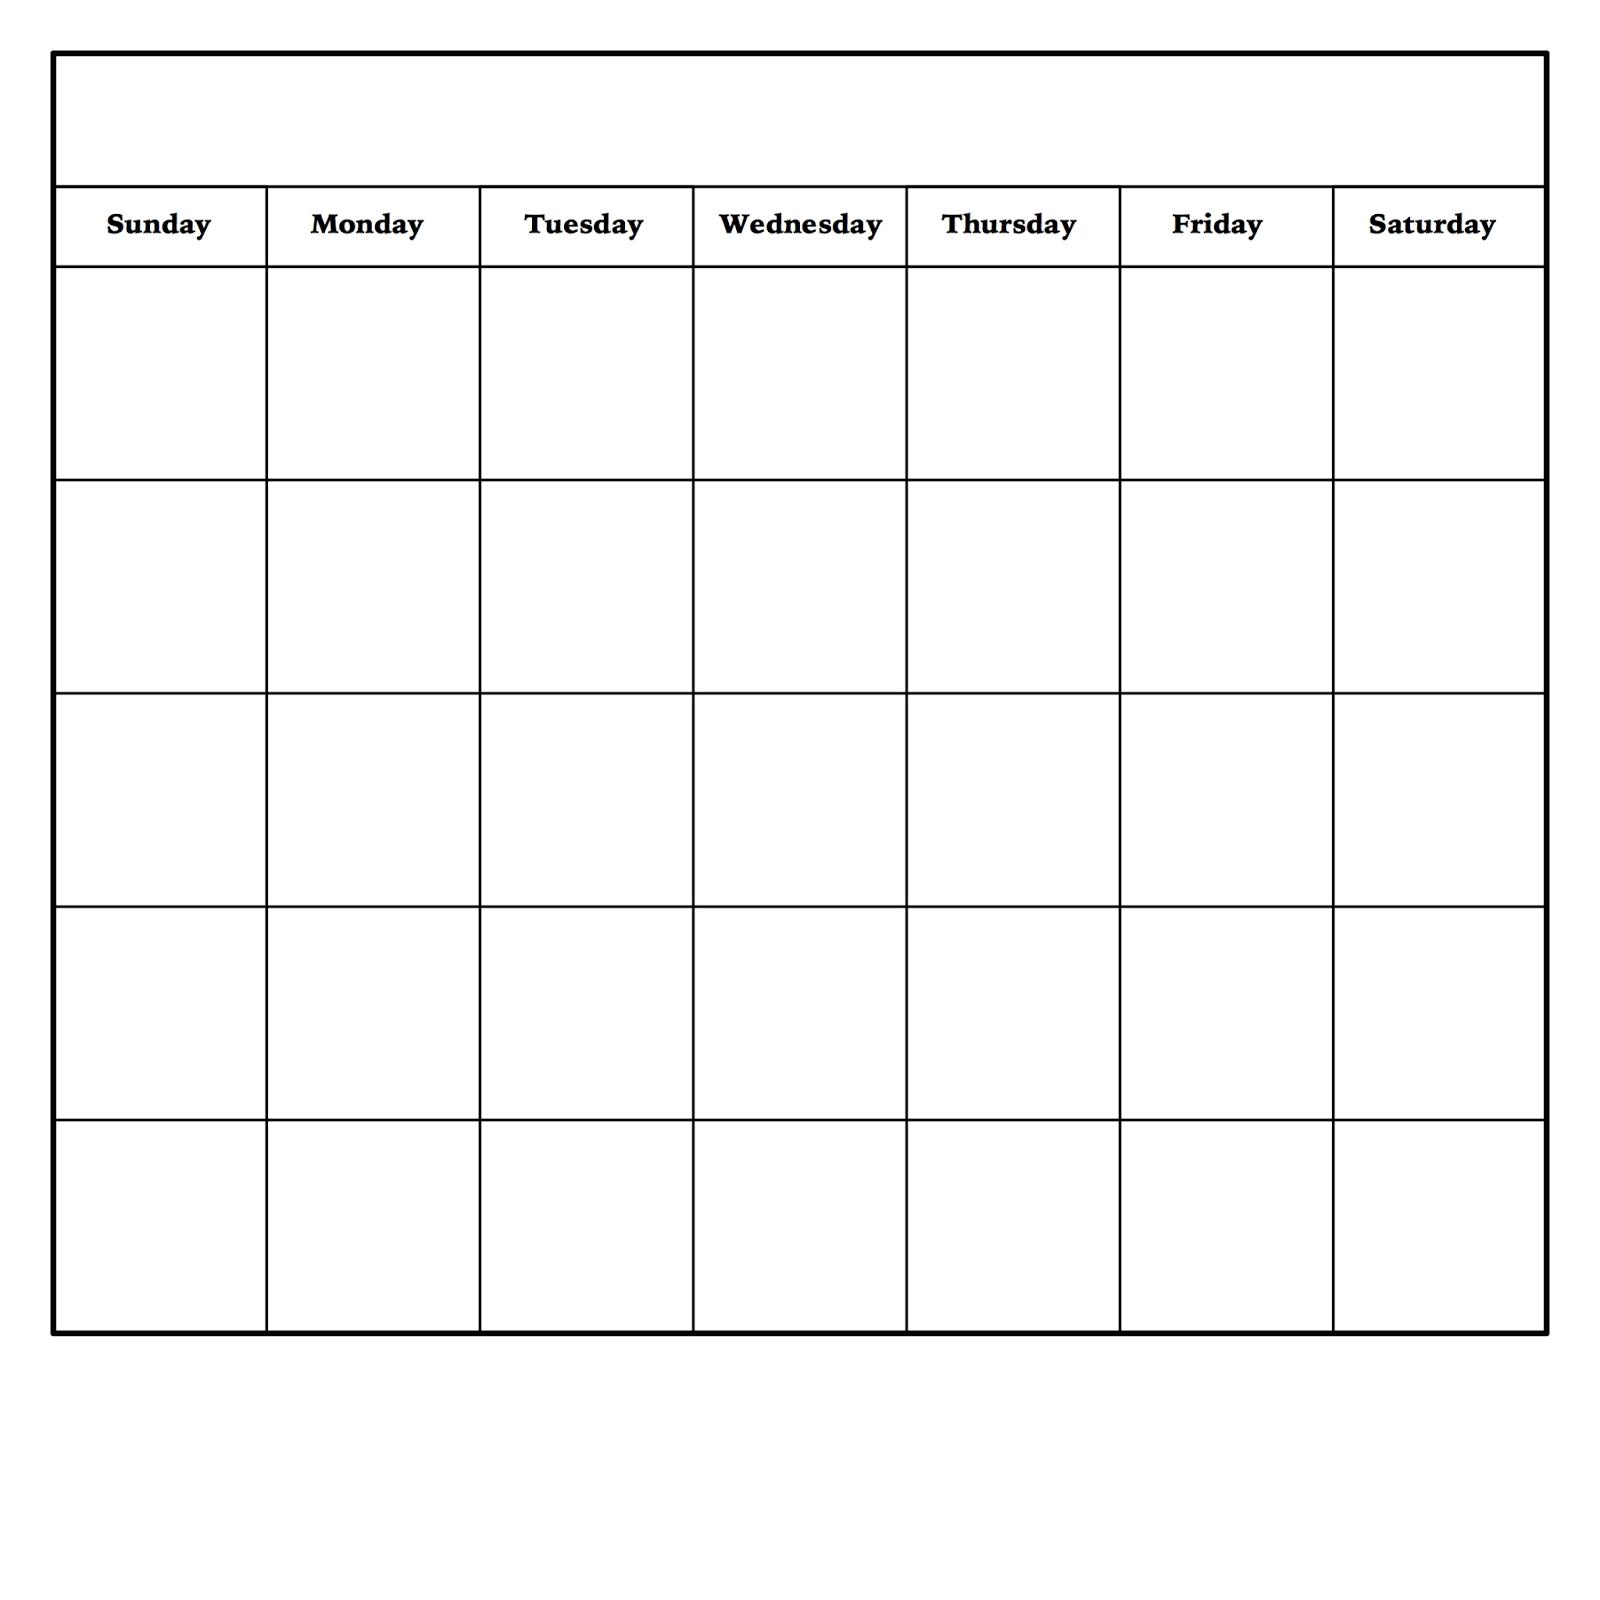 Diy Dry Erase Calendar   Blank Monthly Calendar Template-Printable Monthly Calendar Sunday To Saturday No Dates